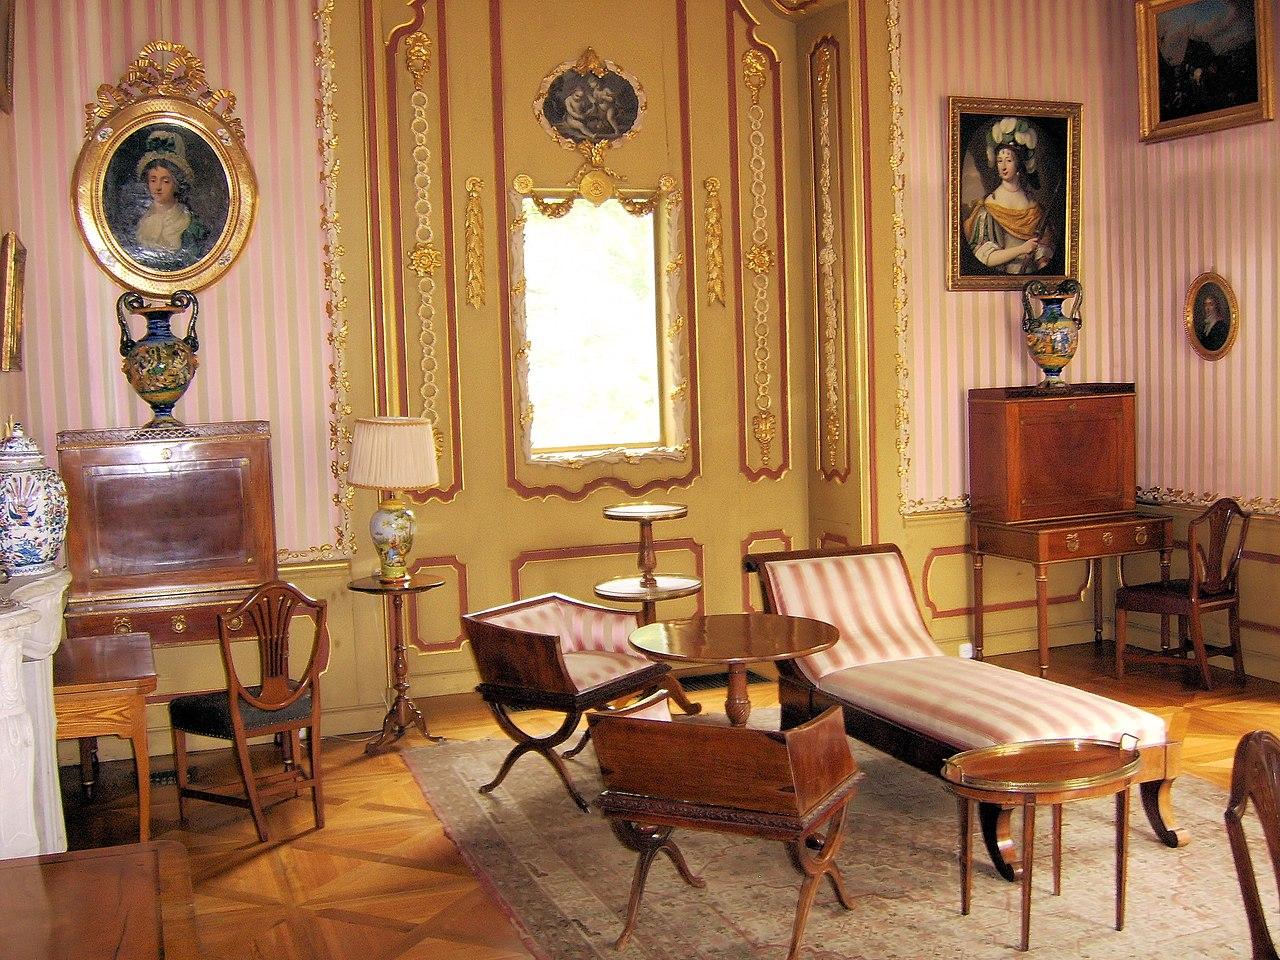 FilePoland Nieborw Palace 008jpg Wikimedia Commons